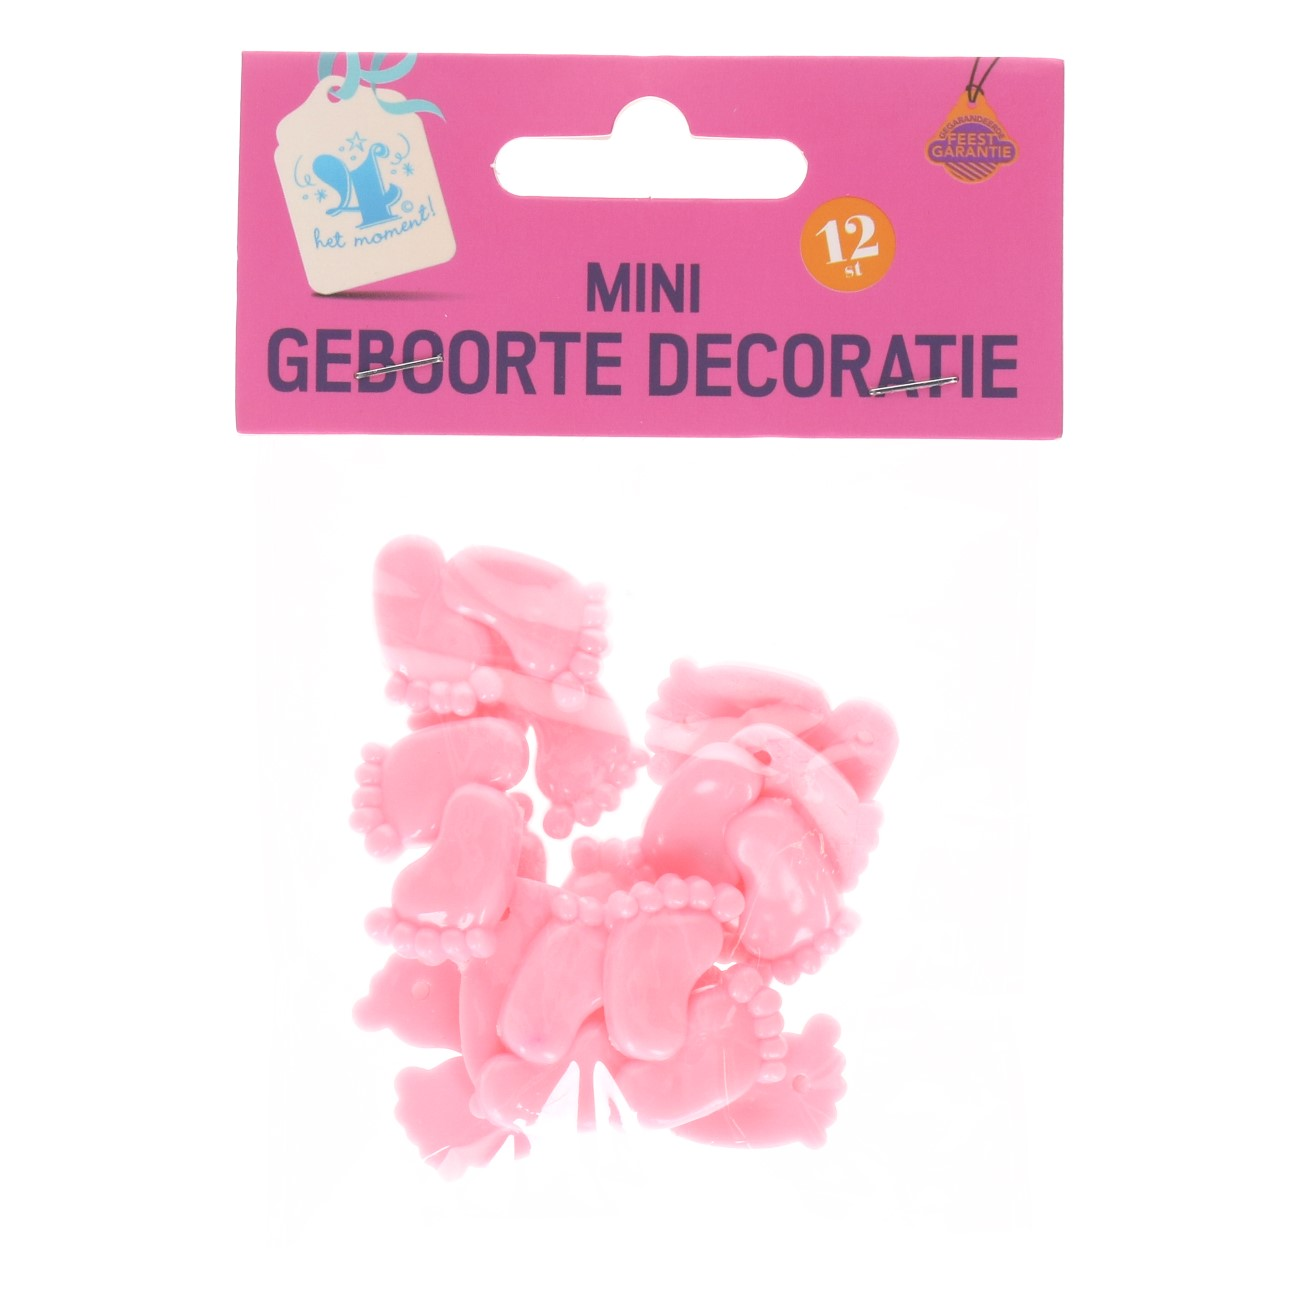 Mini geboorte decoratie roze #672